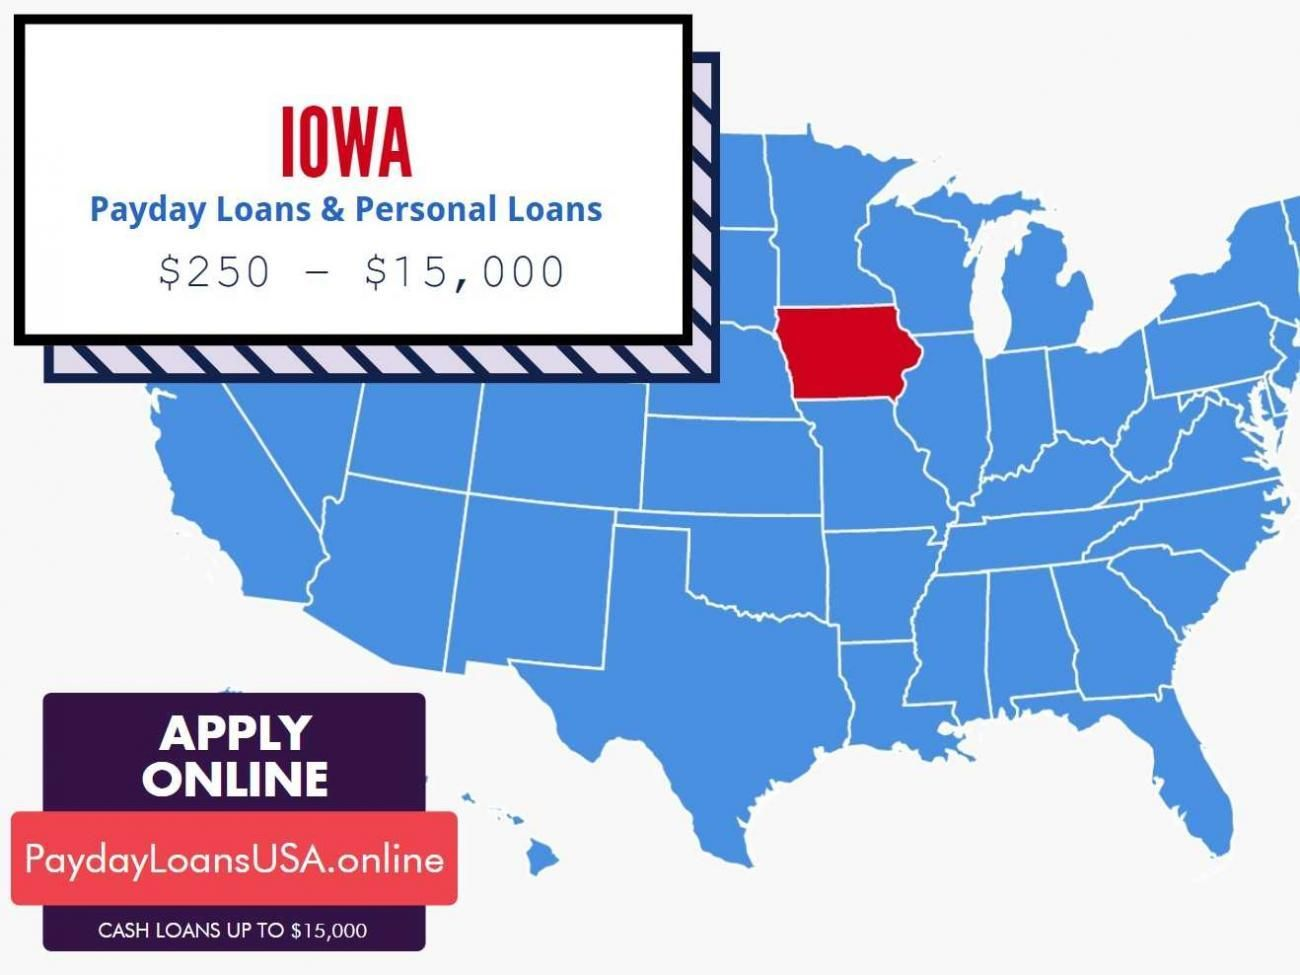 Iowa Cash Advance Payday Loans Personal Loans Payday Loans Personal Loans Payday